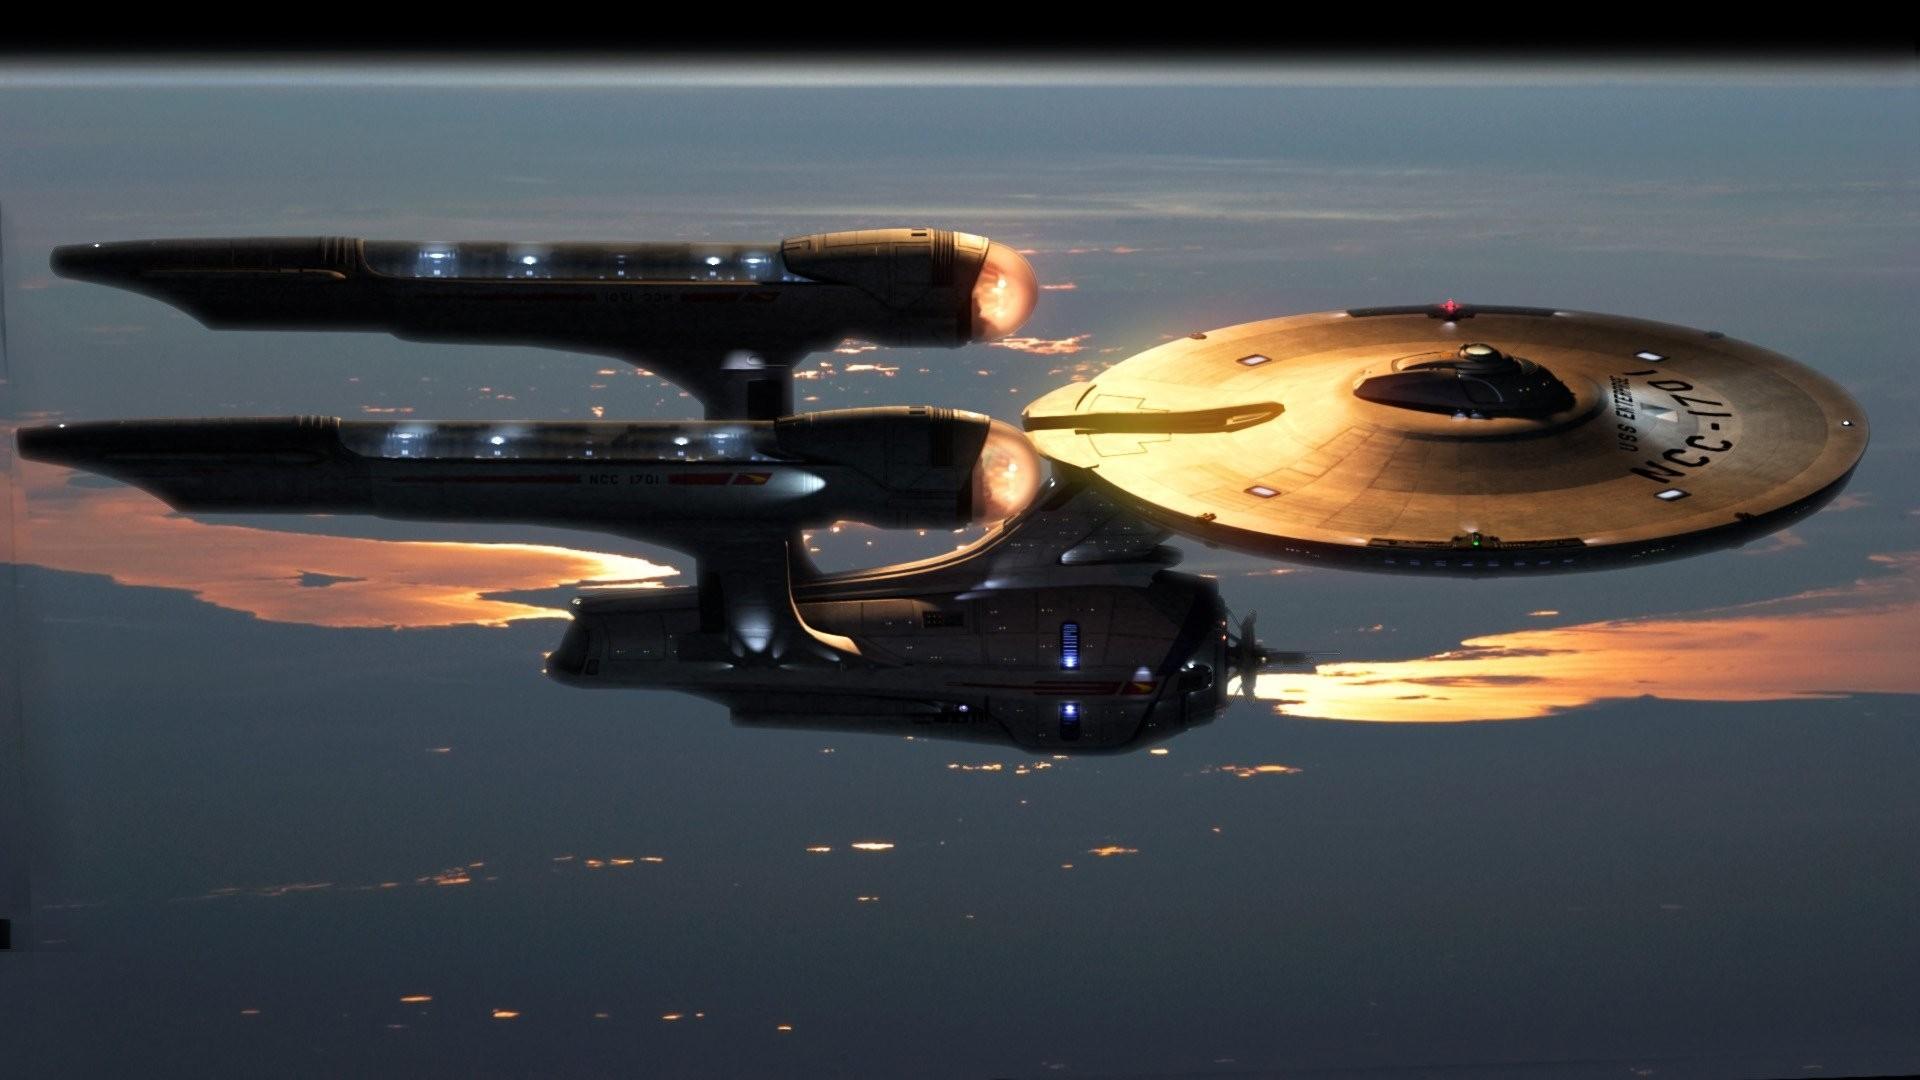 Star Trek Free Wallpaper and Background